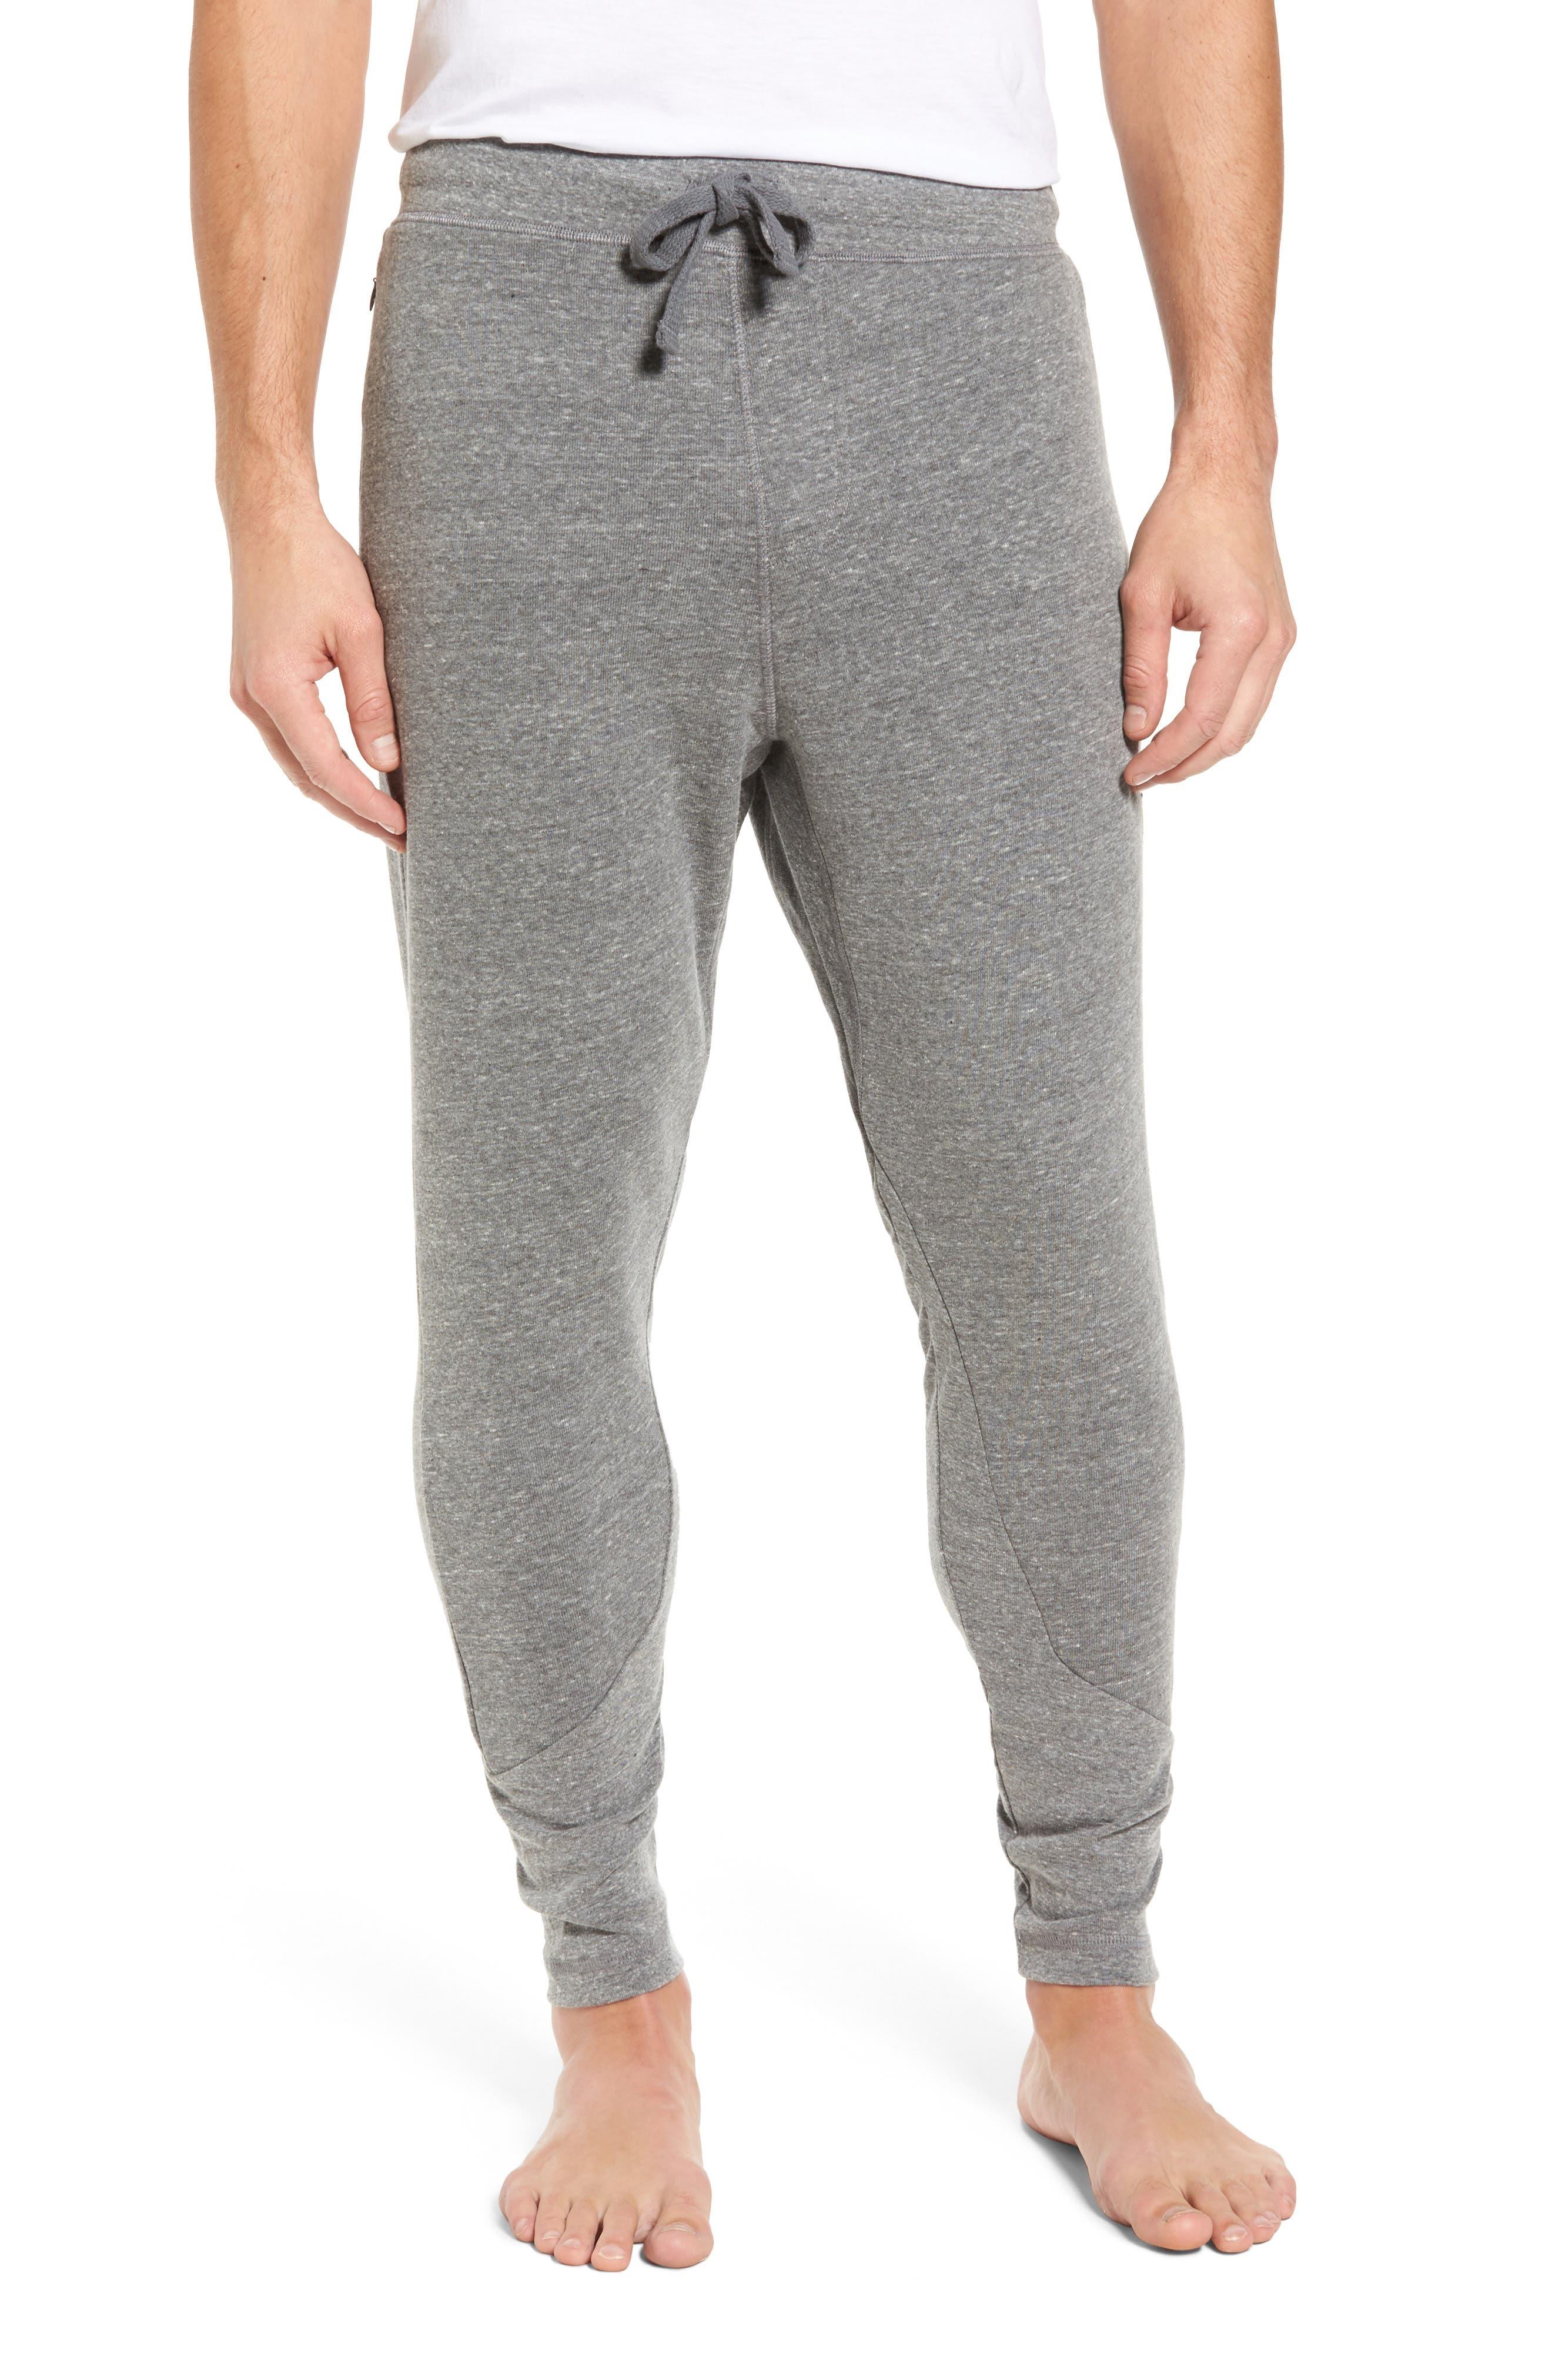 Zealous Slim Sweatpants,                             Main thumbnail 1, color,                             GREY TRIBLEND